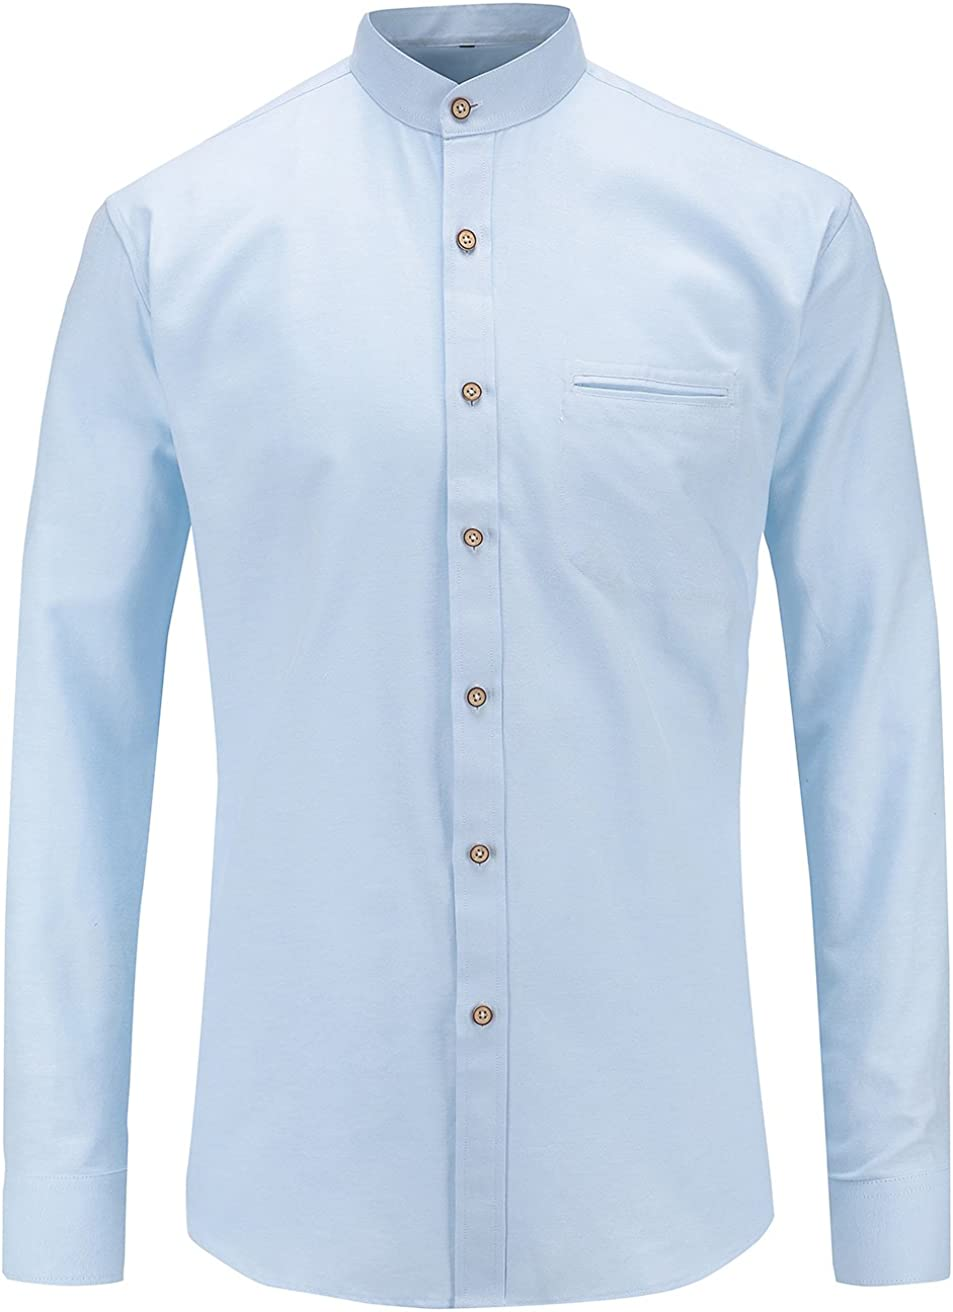 Jandukar Collarless Shirt for Men Long Sleeve Oxford Banded Collar Dress Shirt